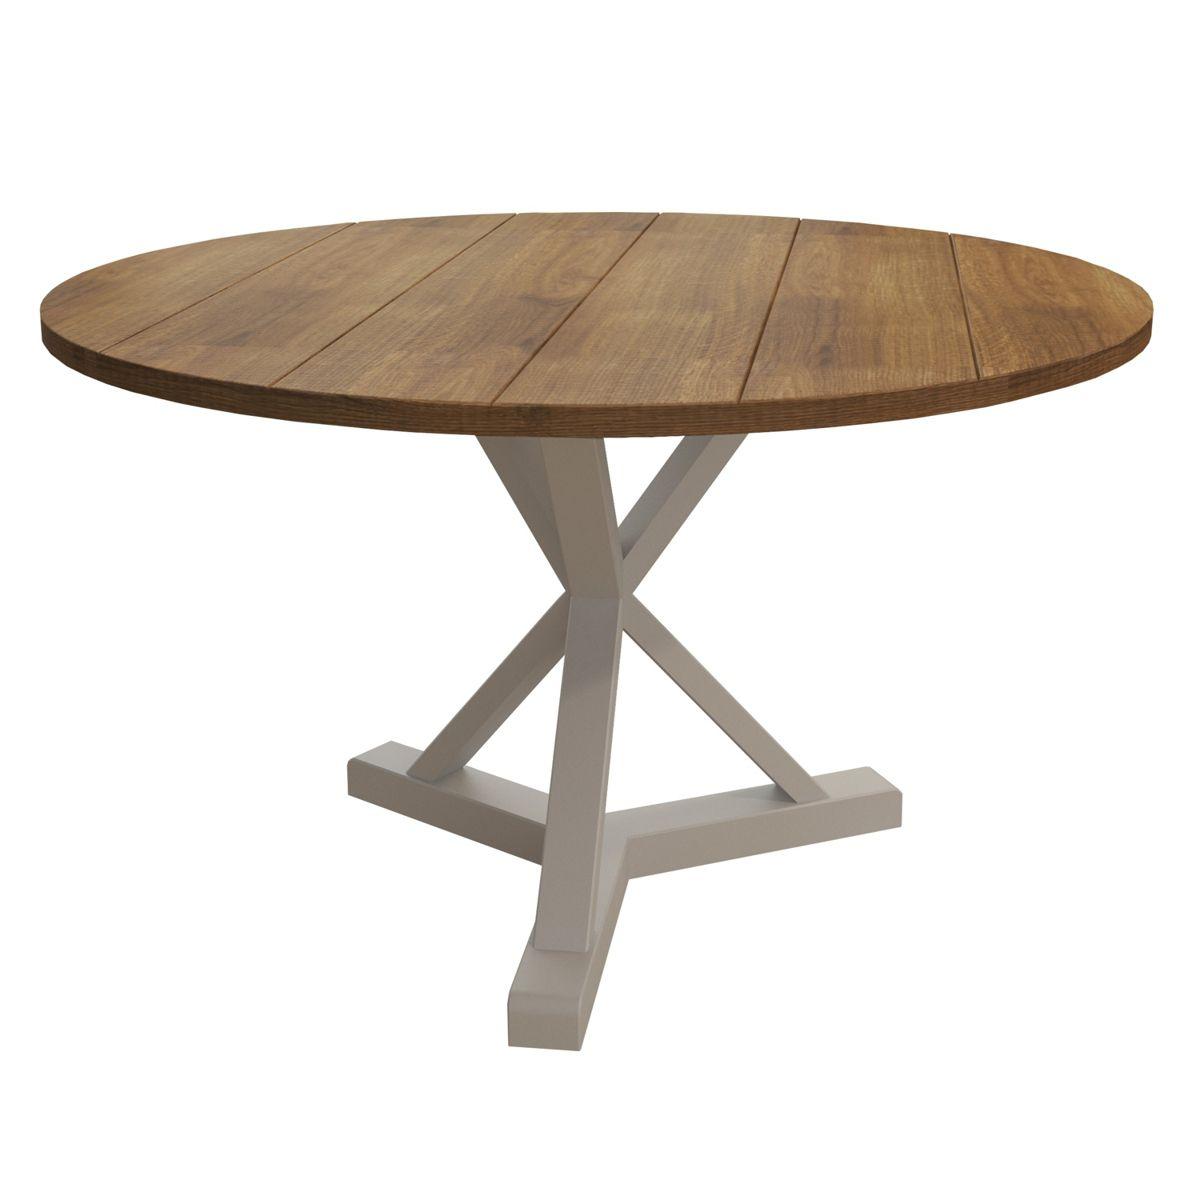 Mesa de Jantar Redonda (120cm) Madeira Maciça, Woods - Branco/Mel